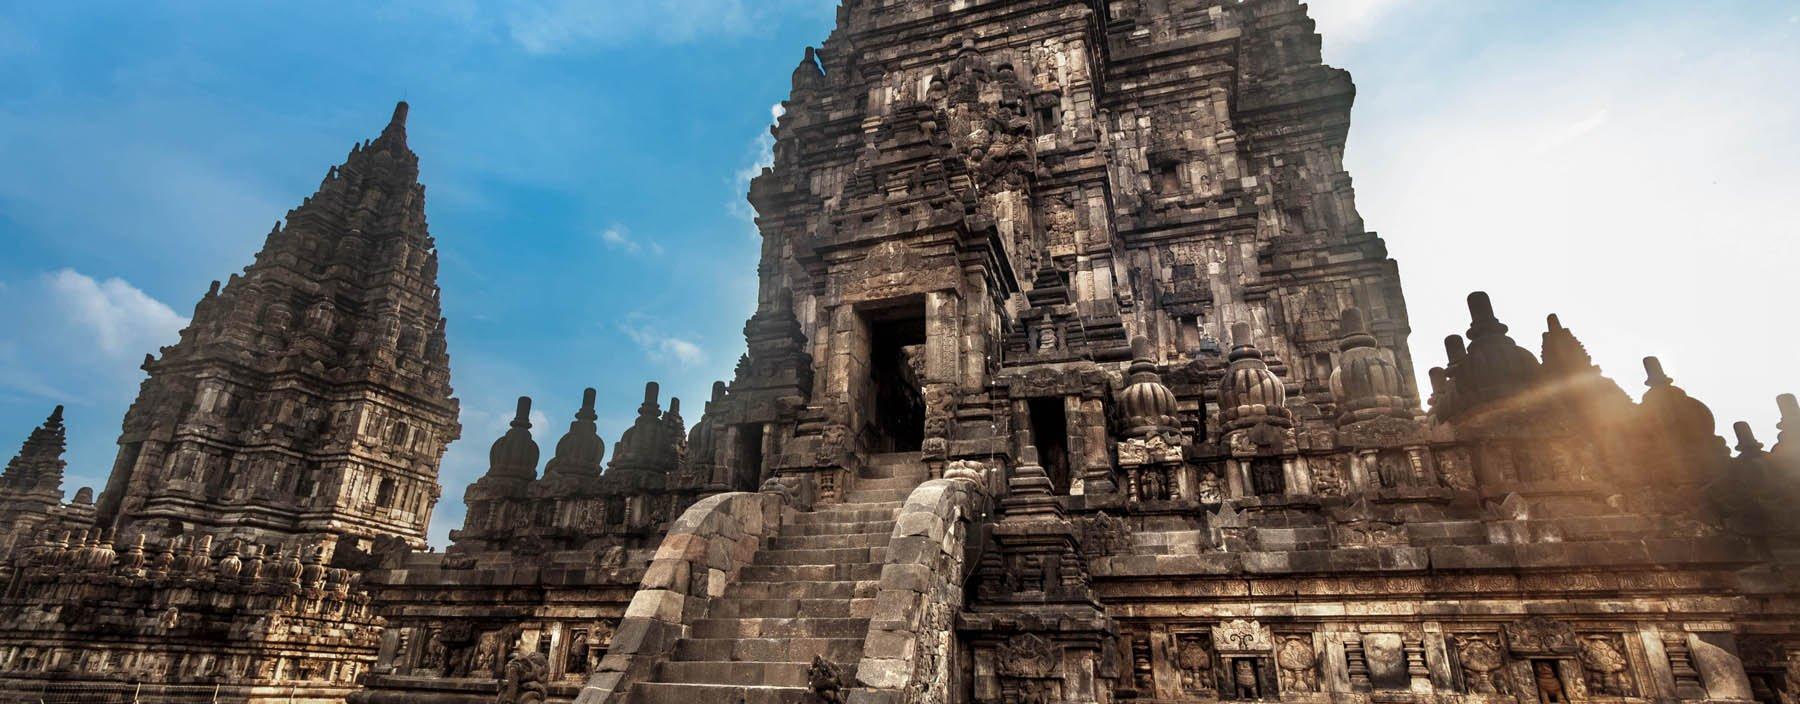 id, java, jogjakarta, prambanan temple (1).jpg